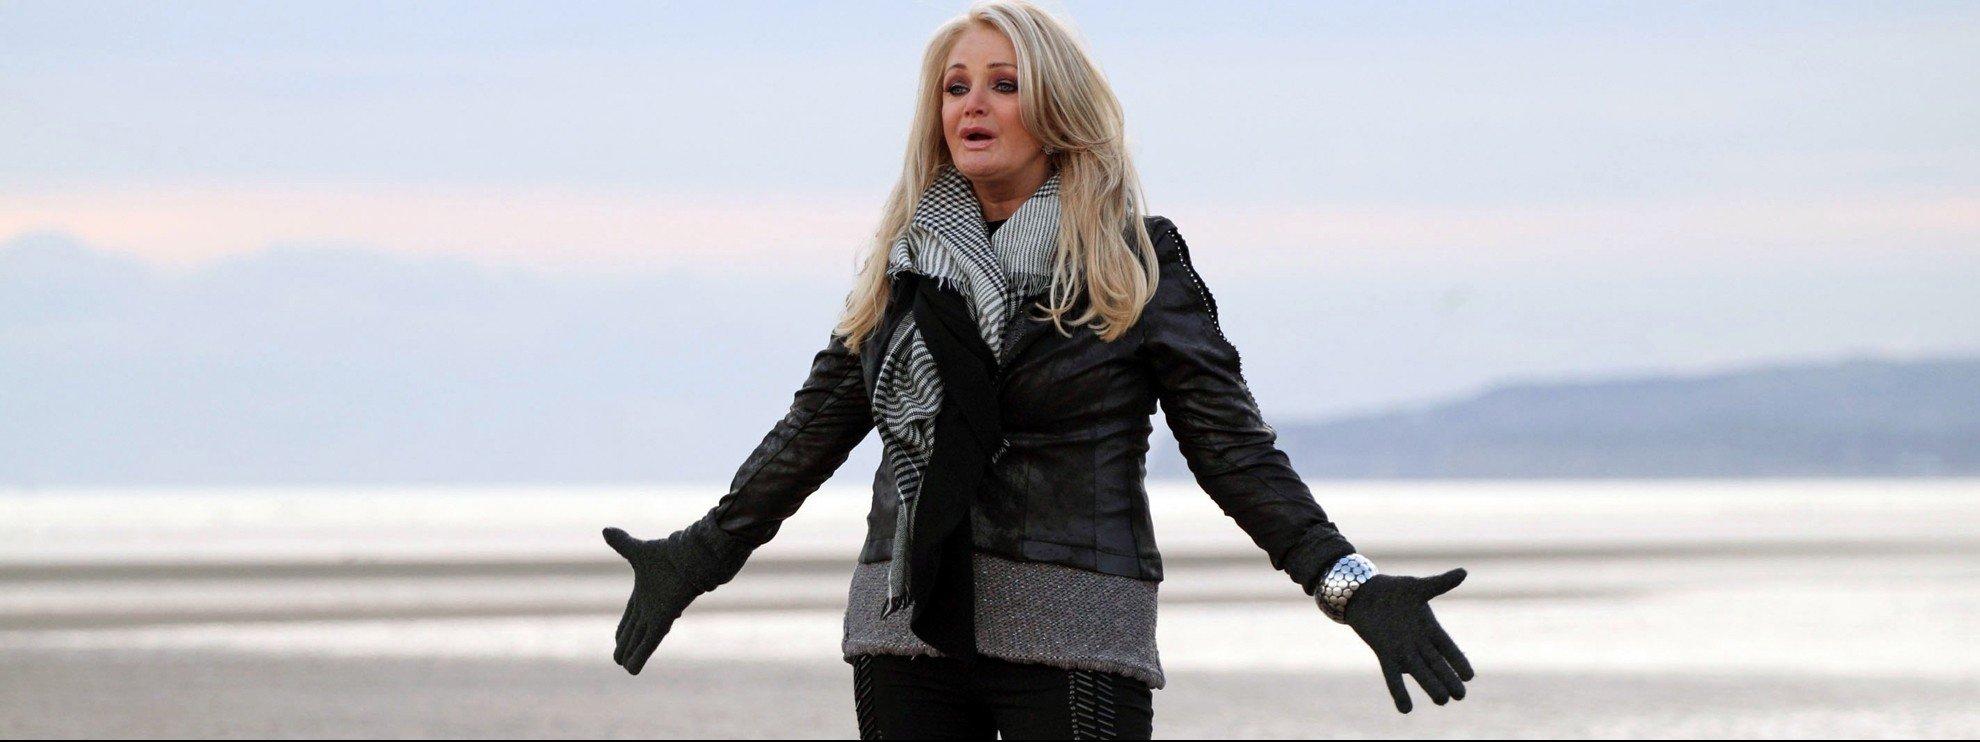 performer Bonnie Tyler